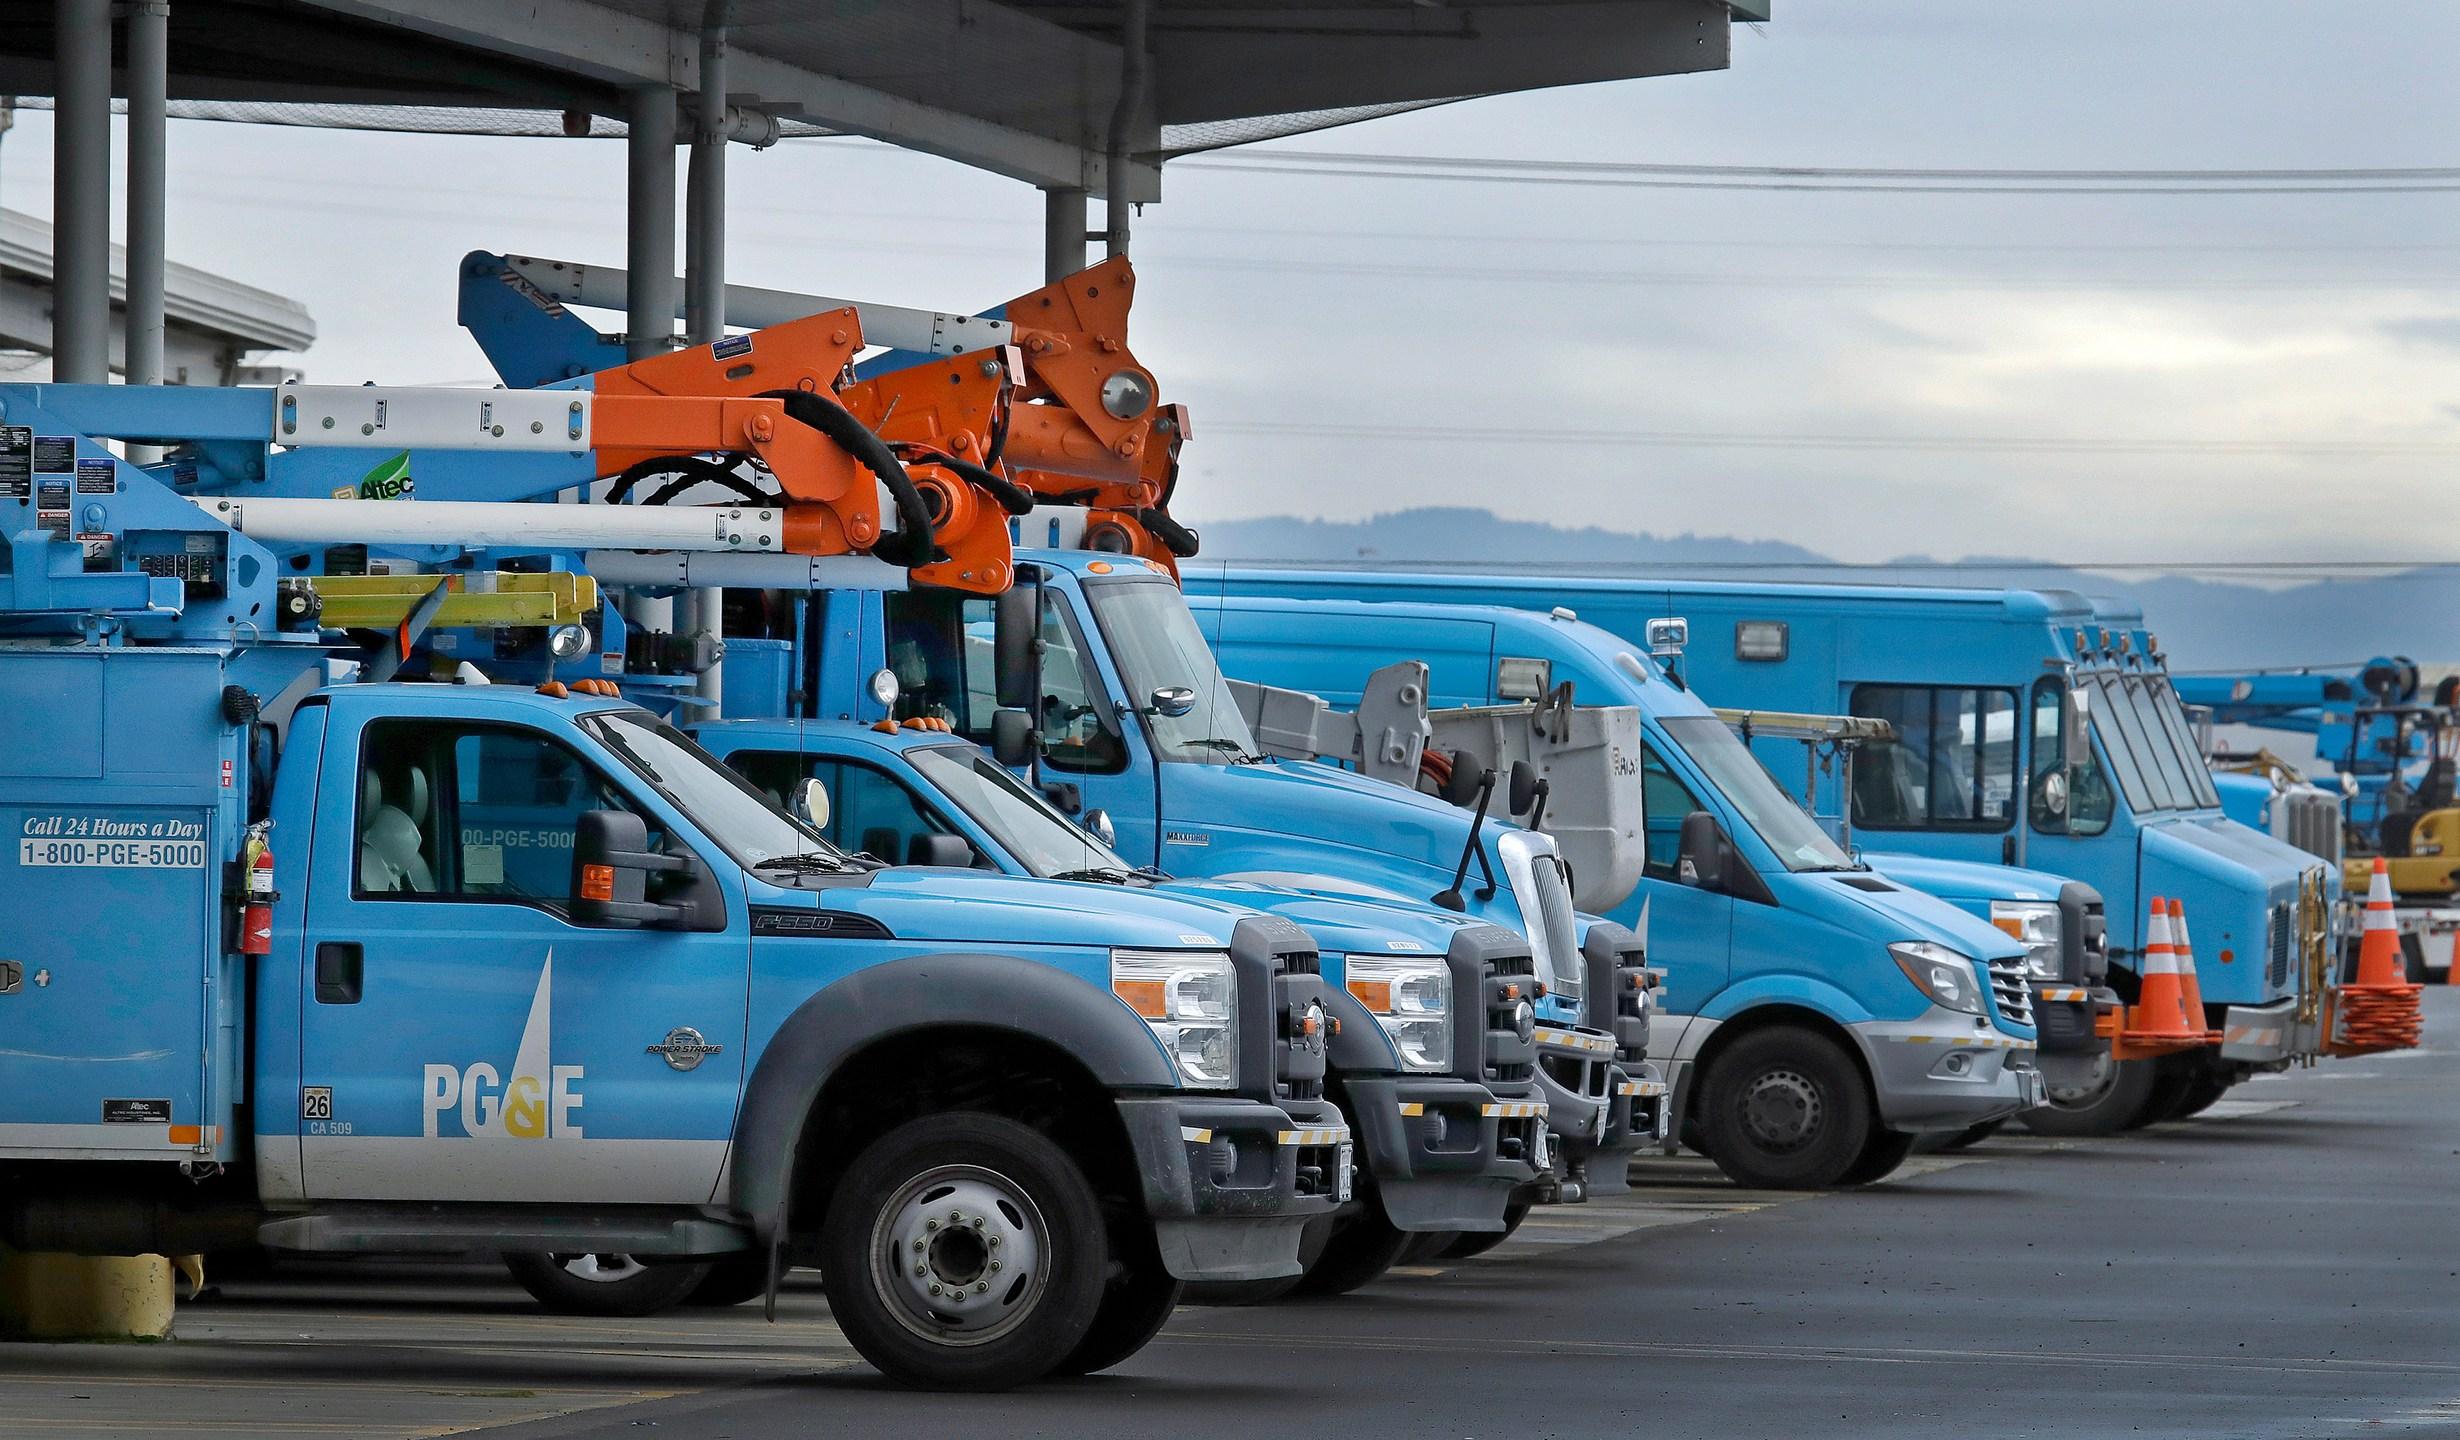 PG & E Work Vehicles